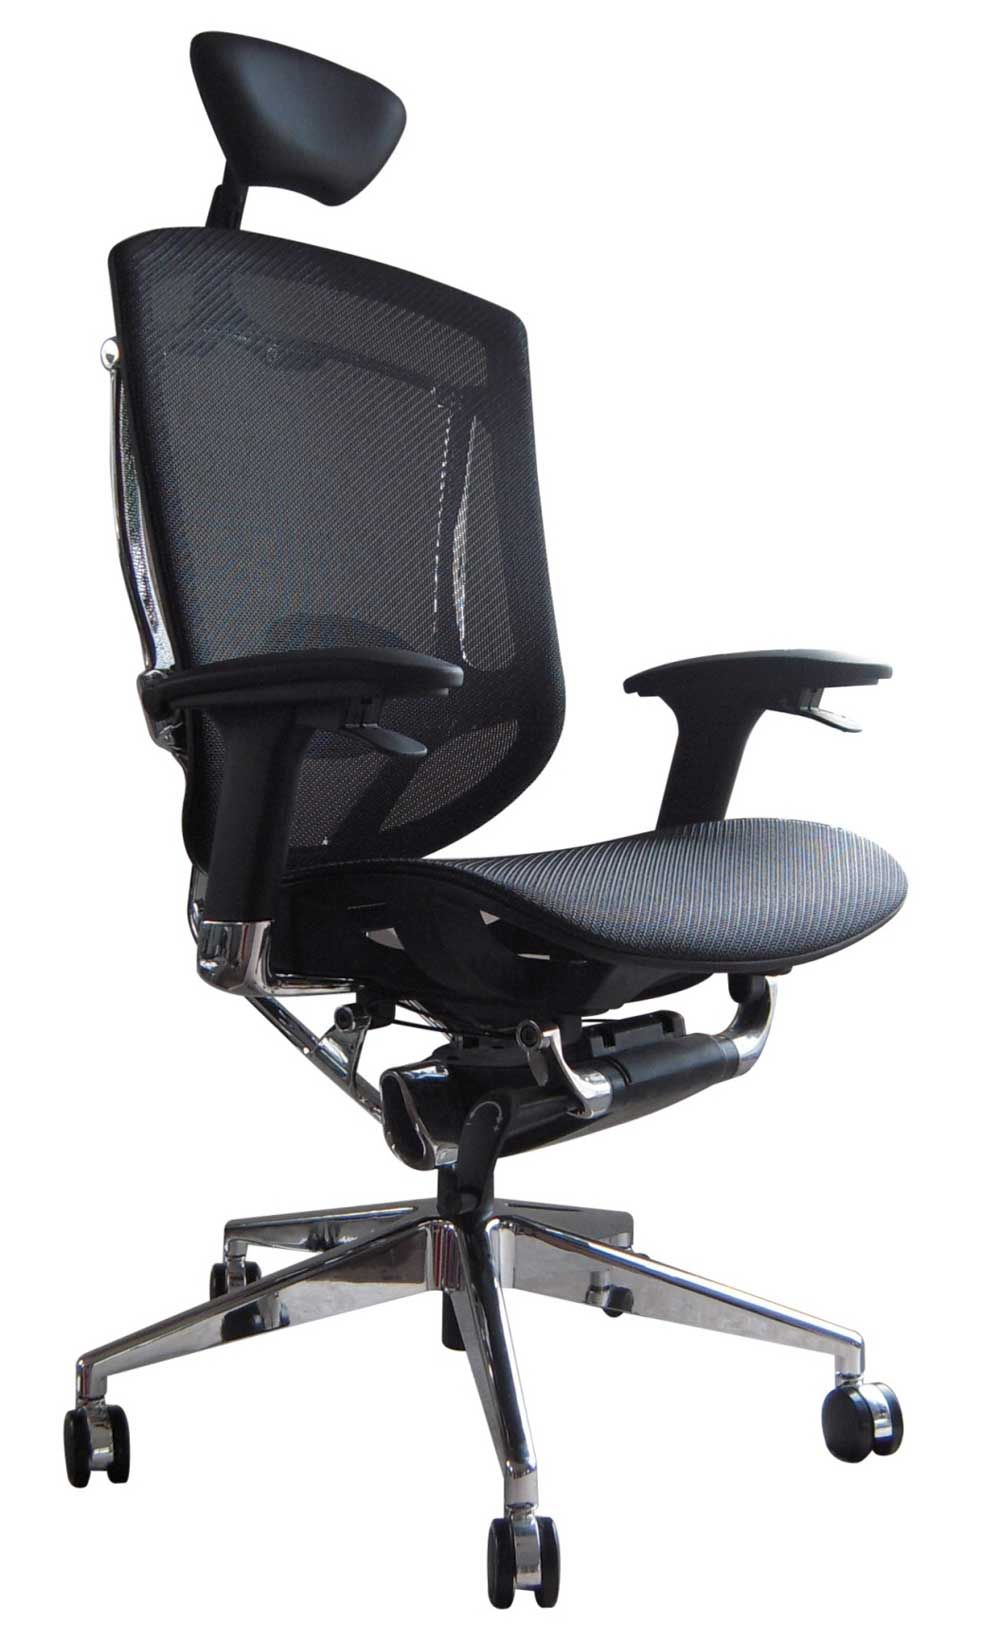 Adjustable Black Ergonomic Computer Chair Office Chair Office Chair Cushion Ergonomic Chair